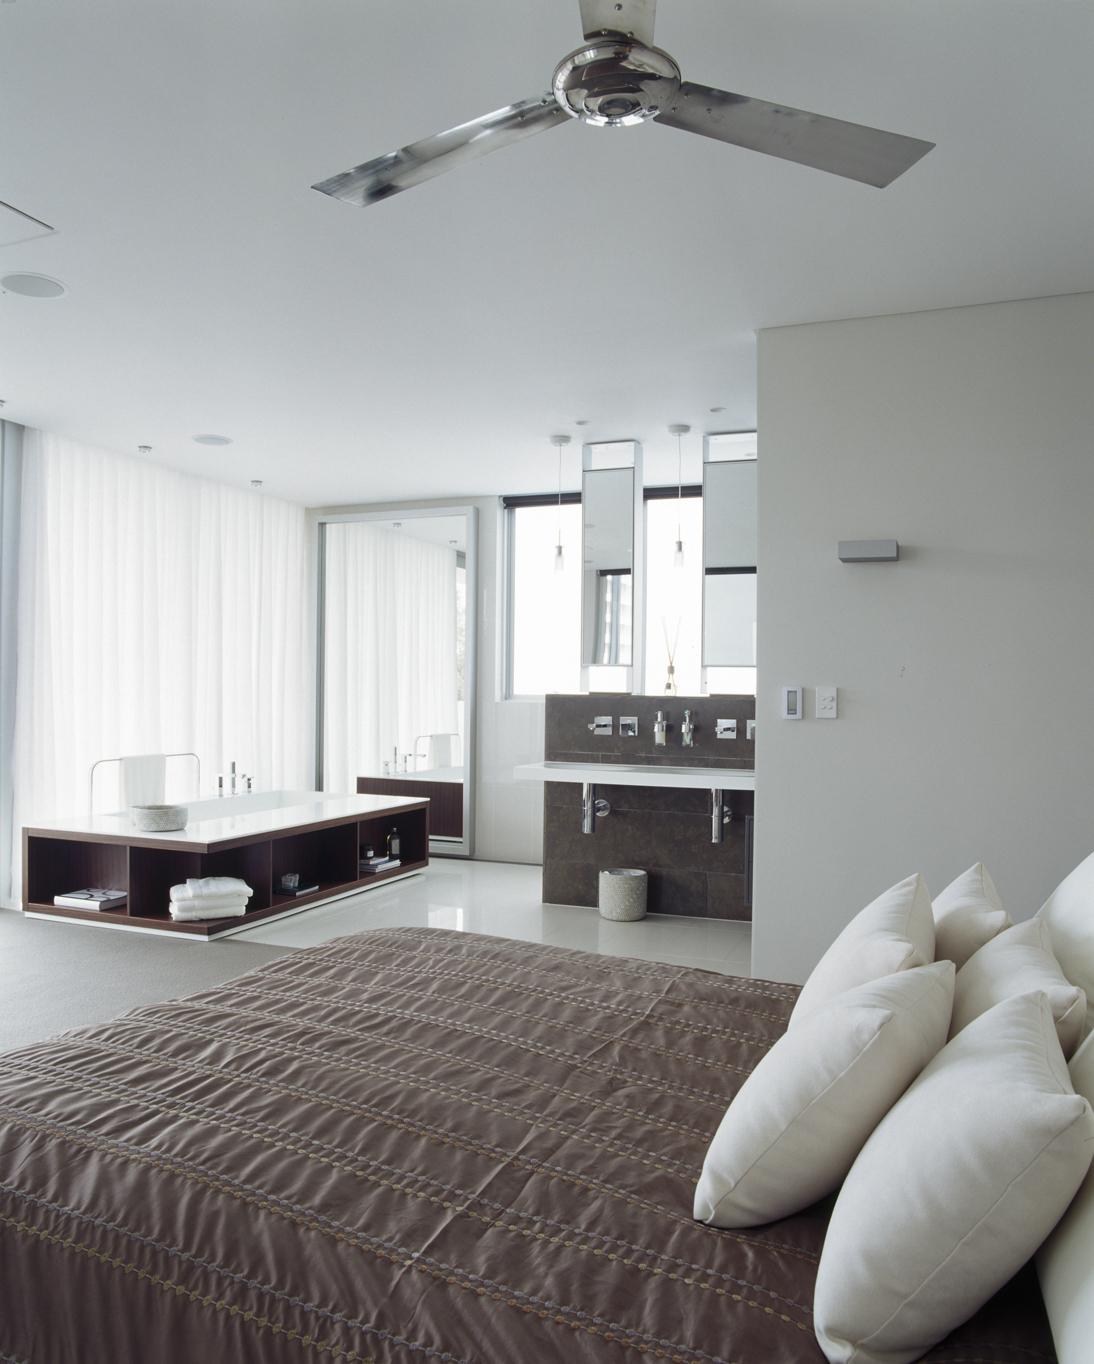 Minosa new minosa bathroom design resort style ensuite - Minosa New Minosa Bathroom Design Resort Style Ensuite 12